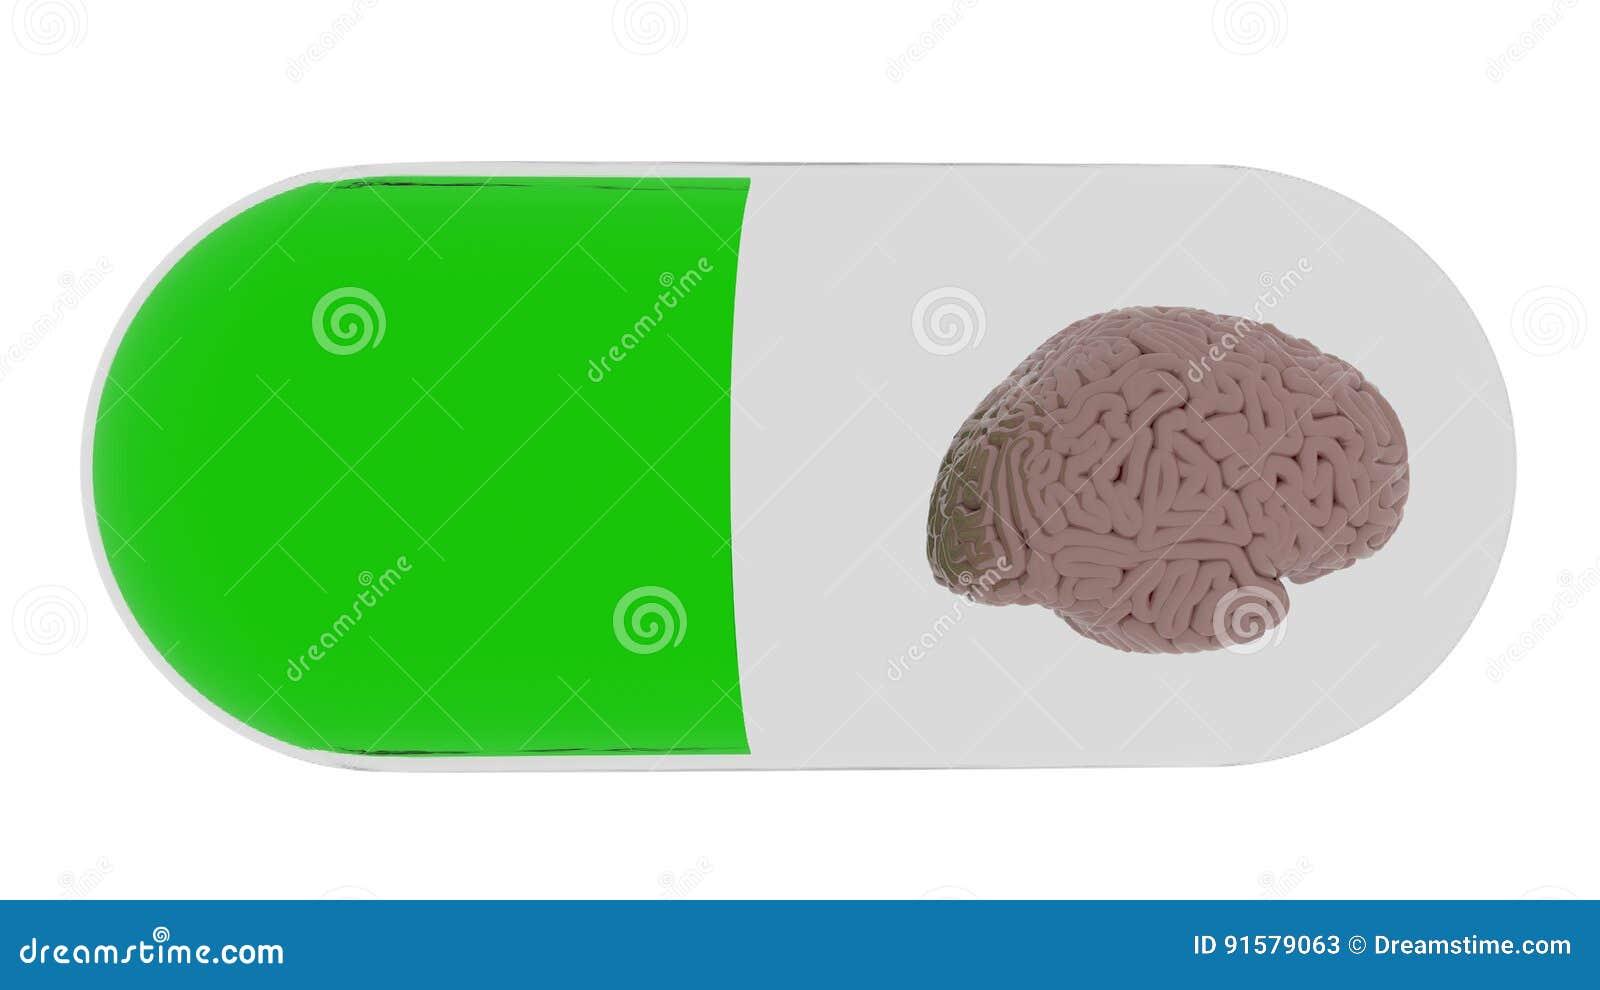 aneurysm cartoons  illustrations   vector stock images Brain Aneurysm Awareness Items Brain Aneurysm Ribbon Tattoos